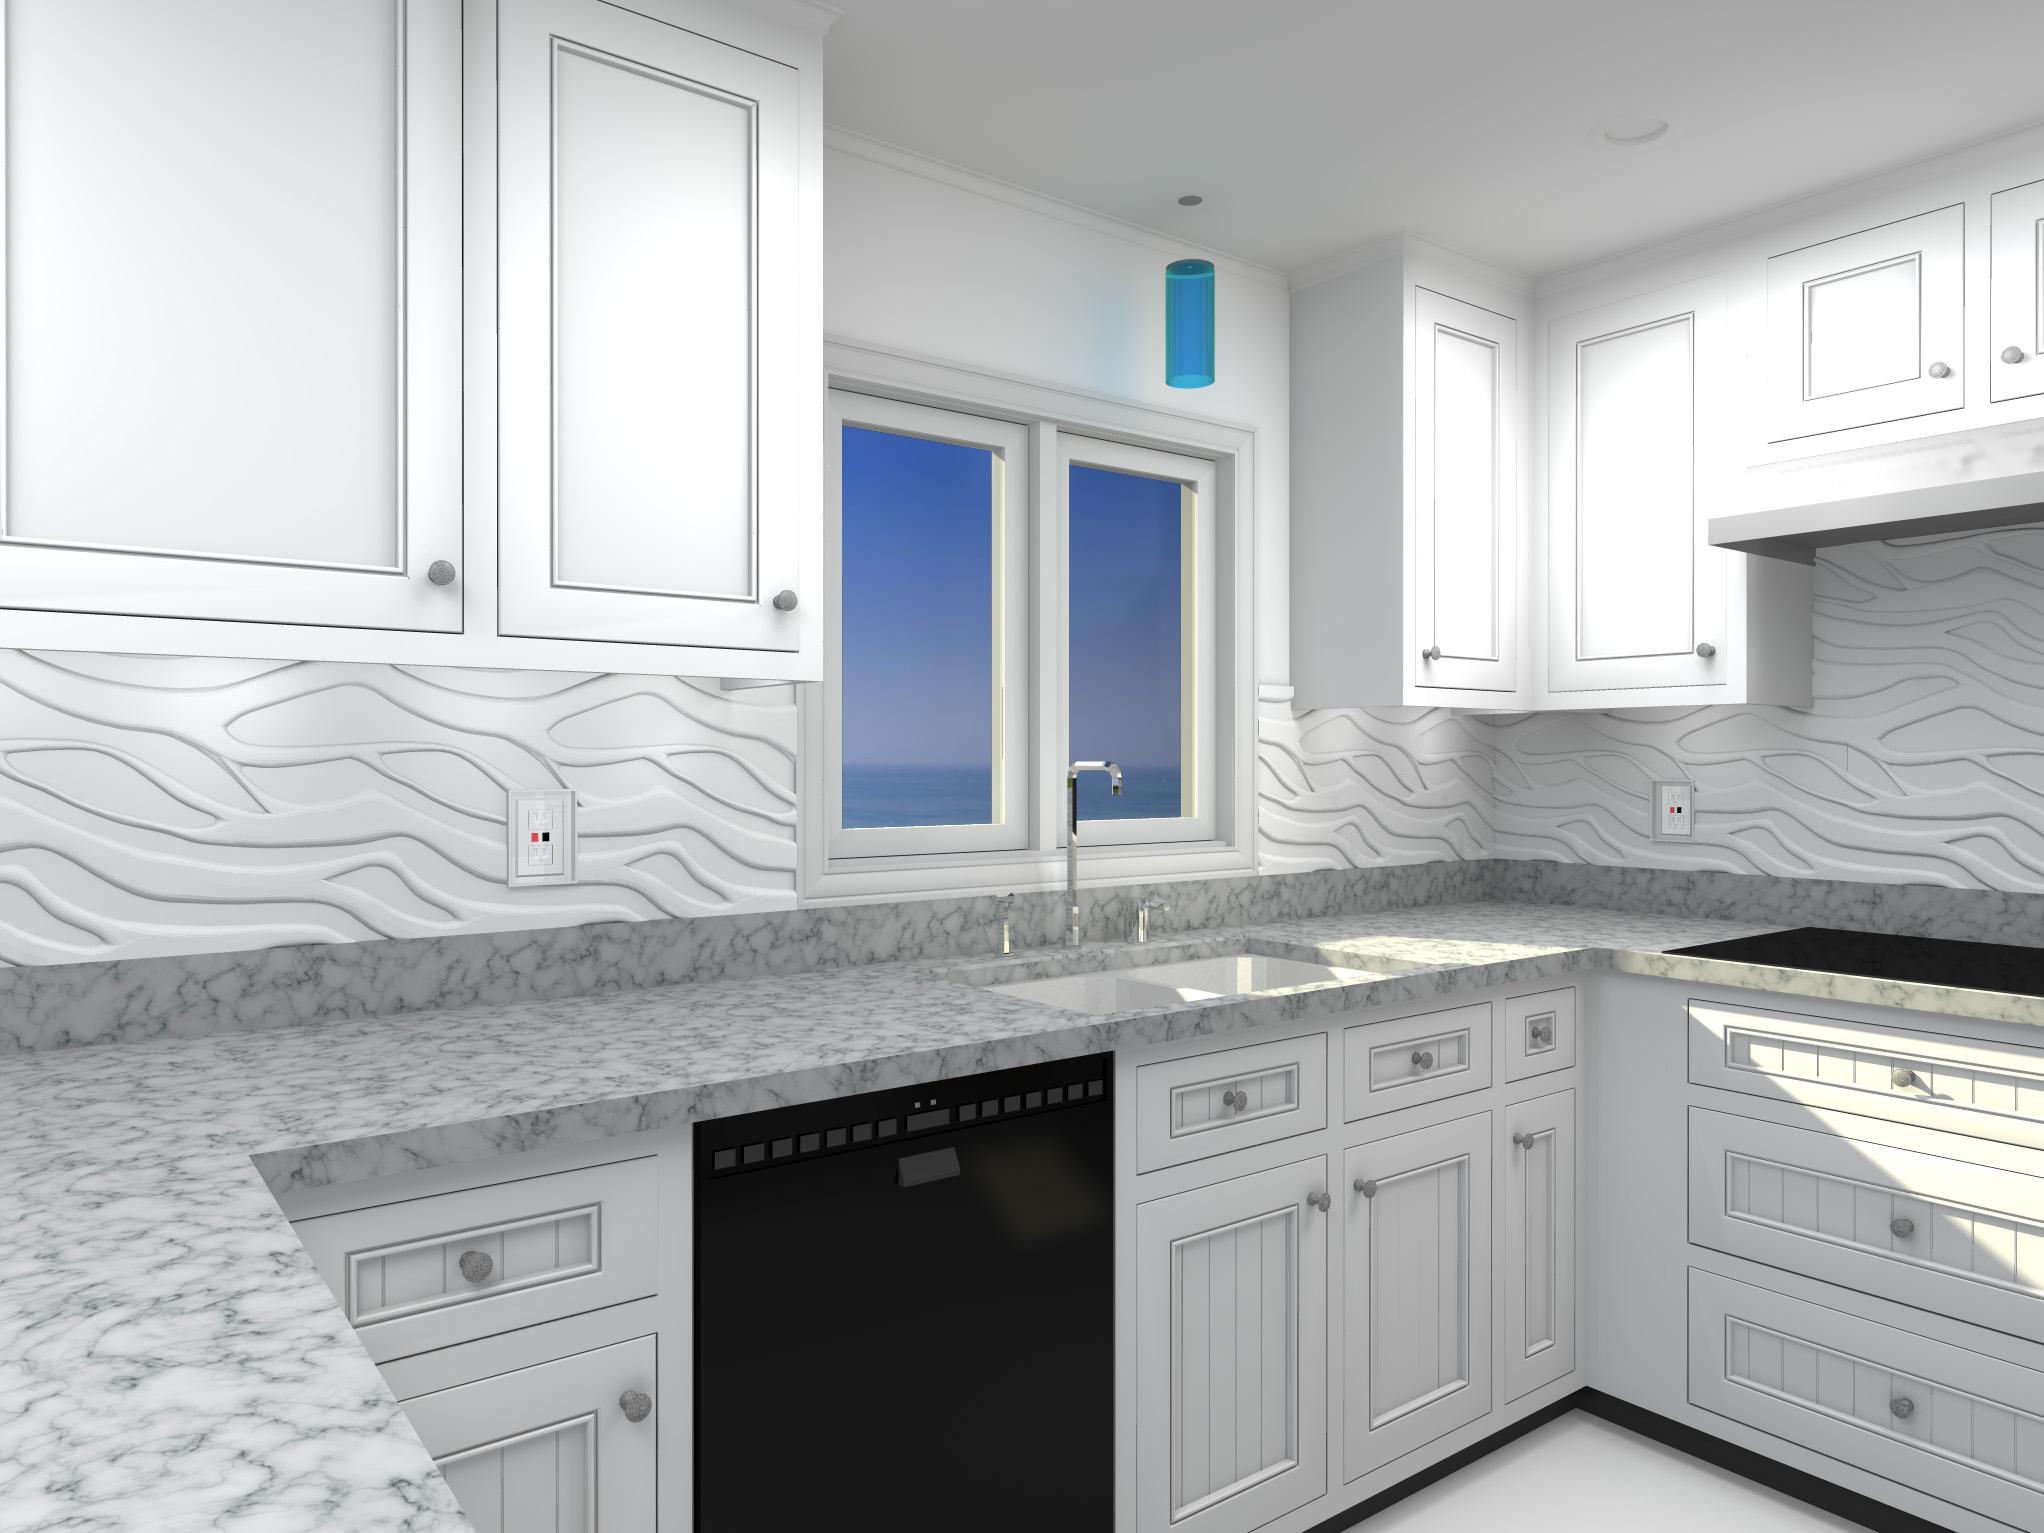 commercial kitchen hoods installation operation unpack commercial kitchen simple materials subway tile backsplash